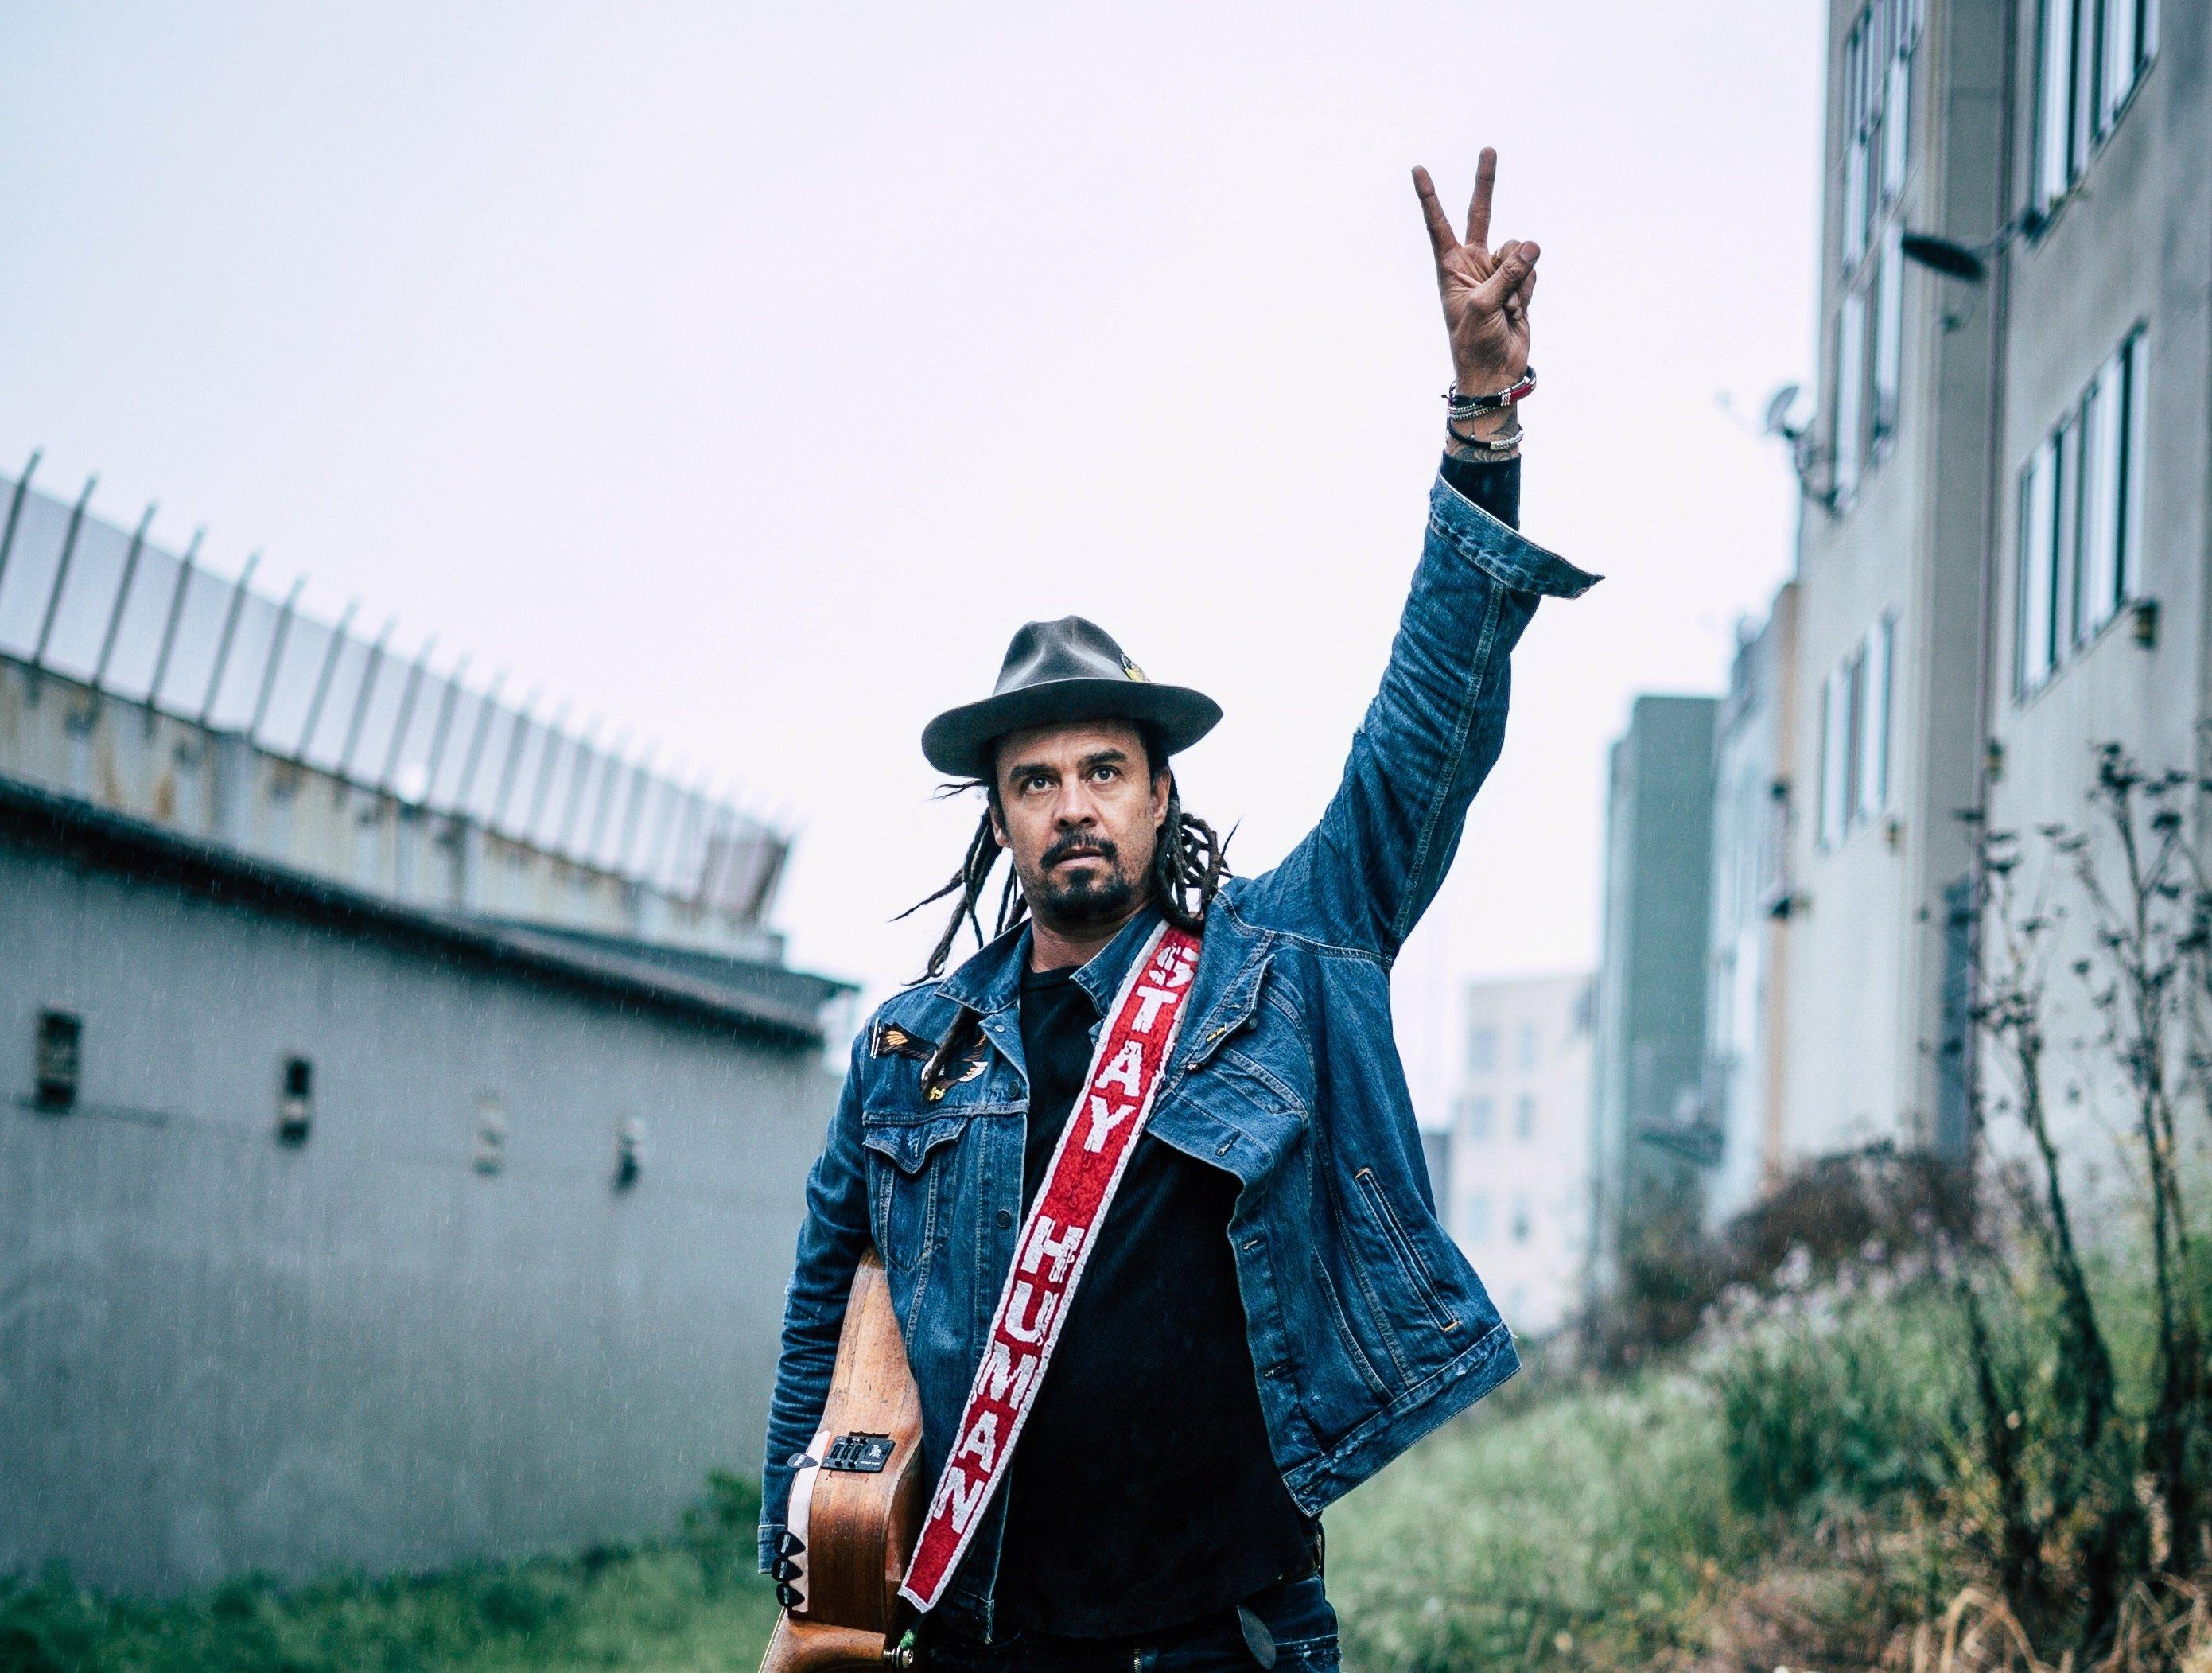 TRACK PREMIERE: Michael Franti - 'Nobody Cries Alone' - Listen Now